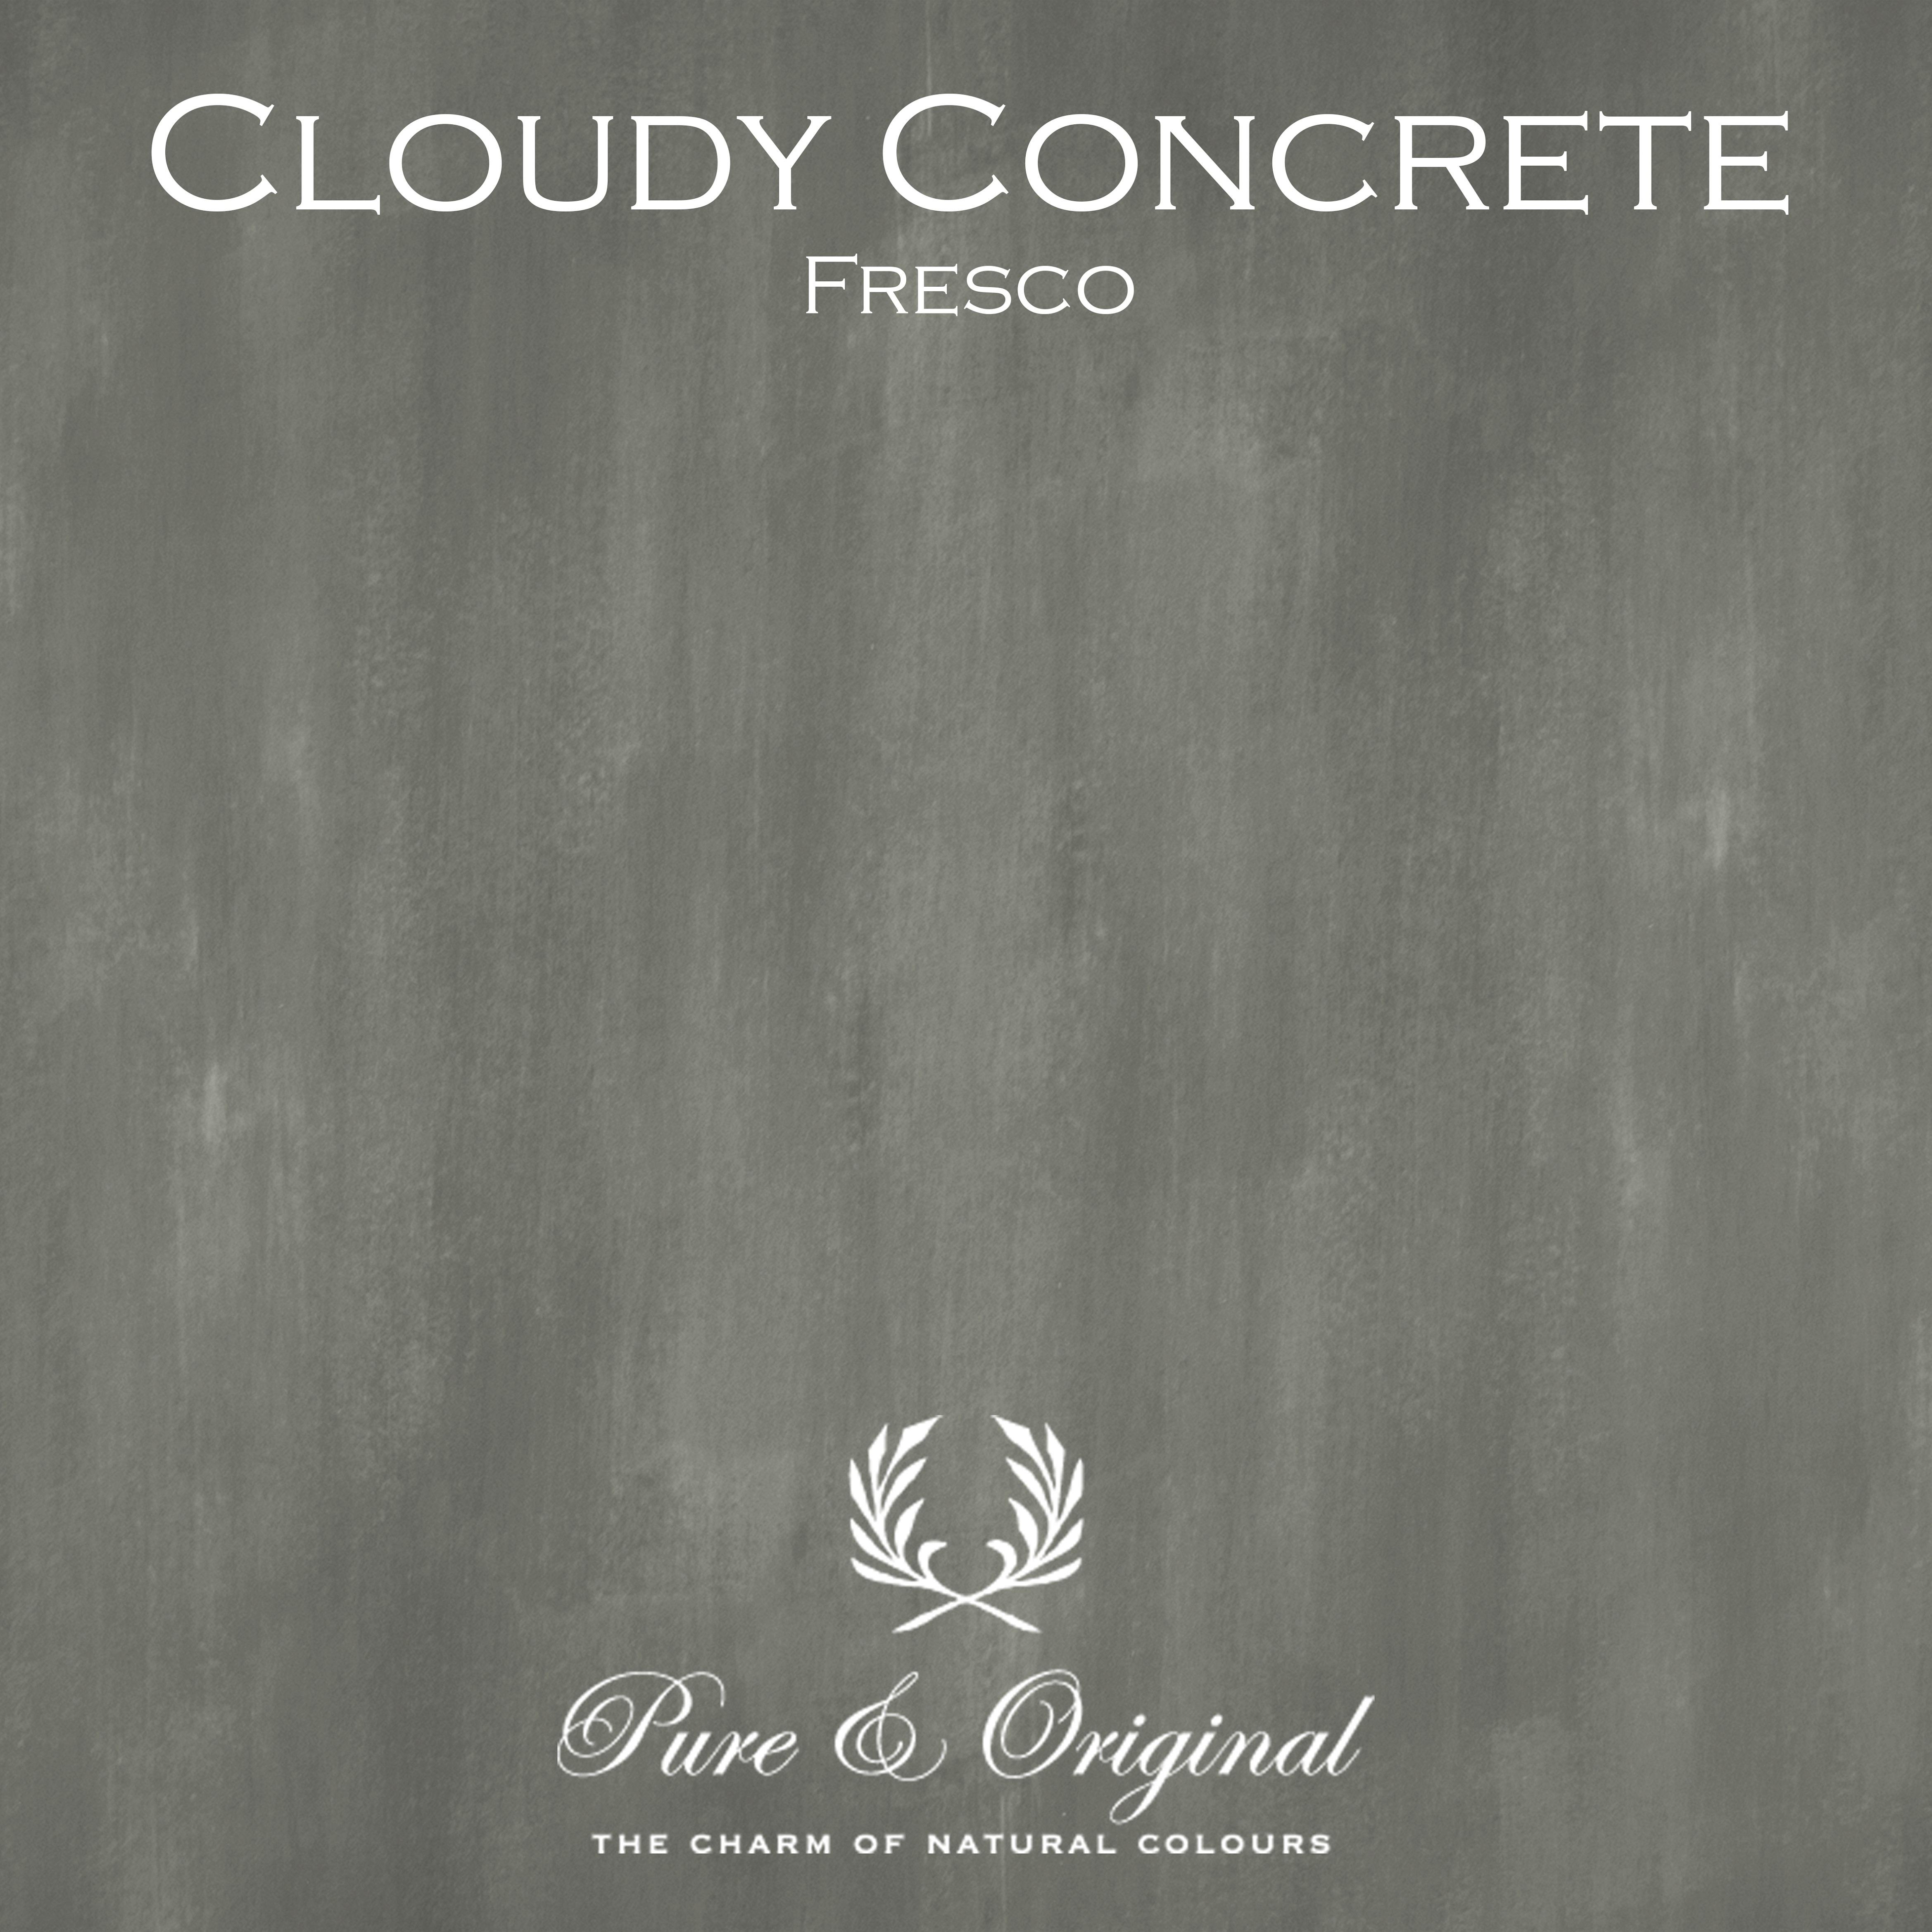 Kulör Cloudy Concrete, Fresco kalkfärg